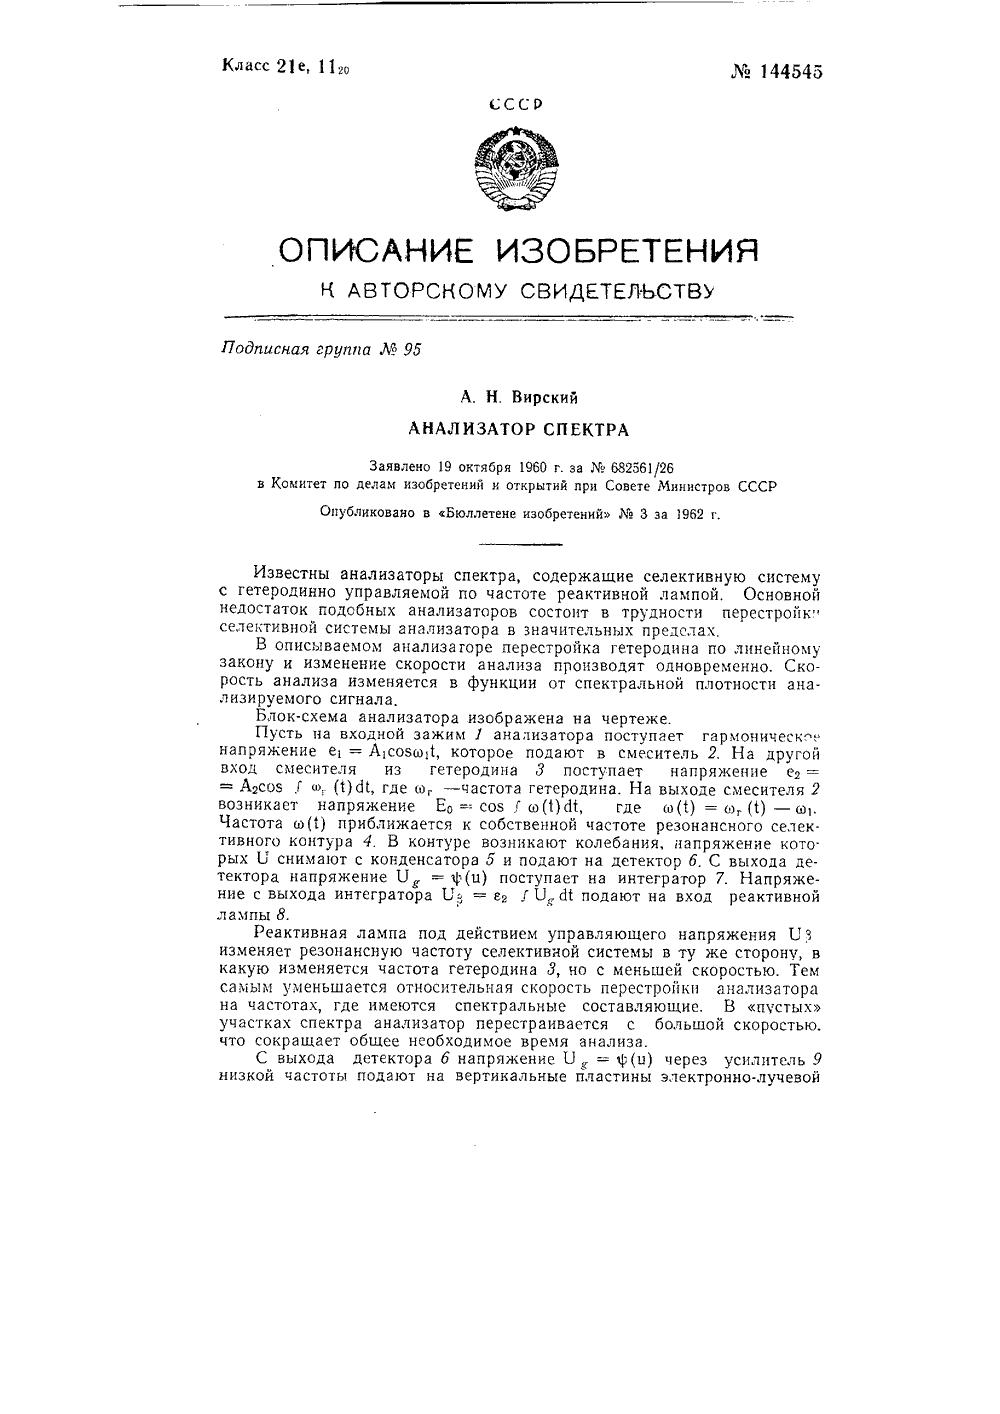 схема 9 полосного анализатора спектра